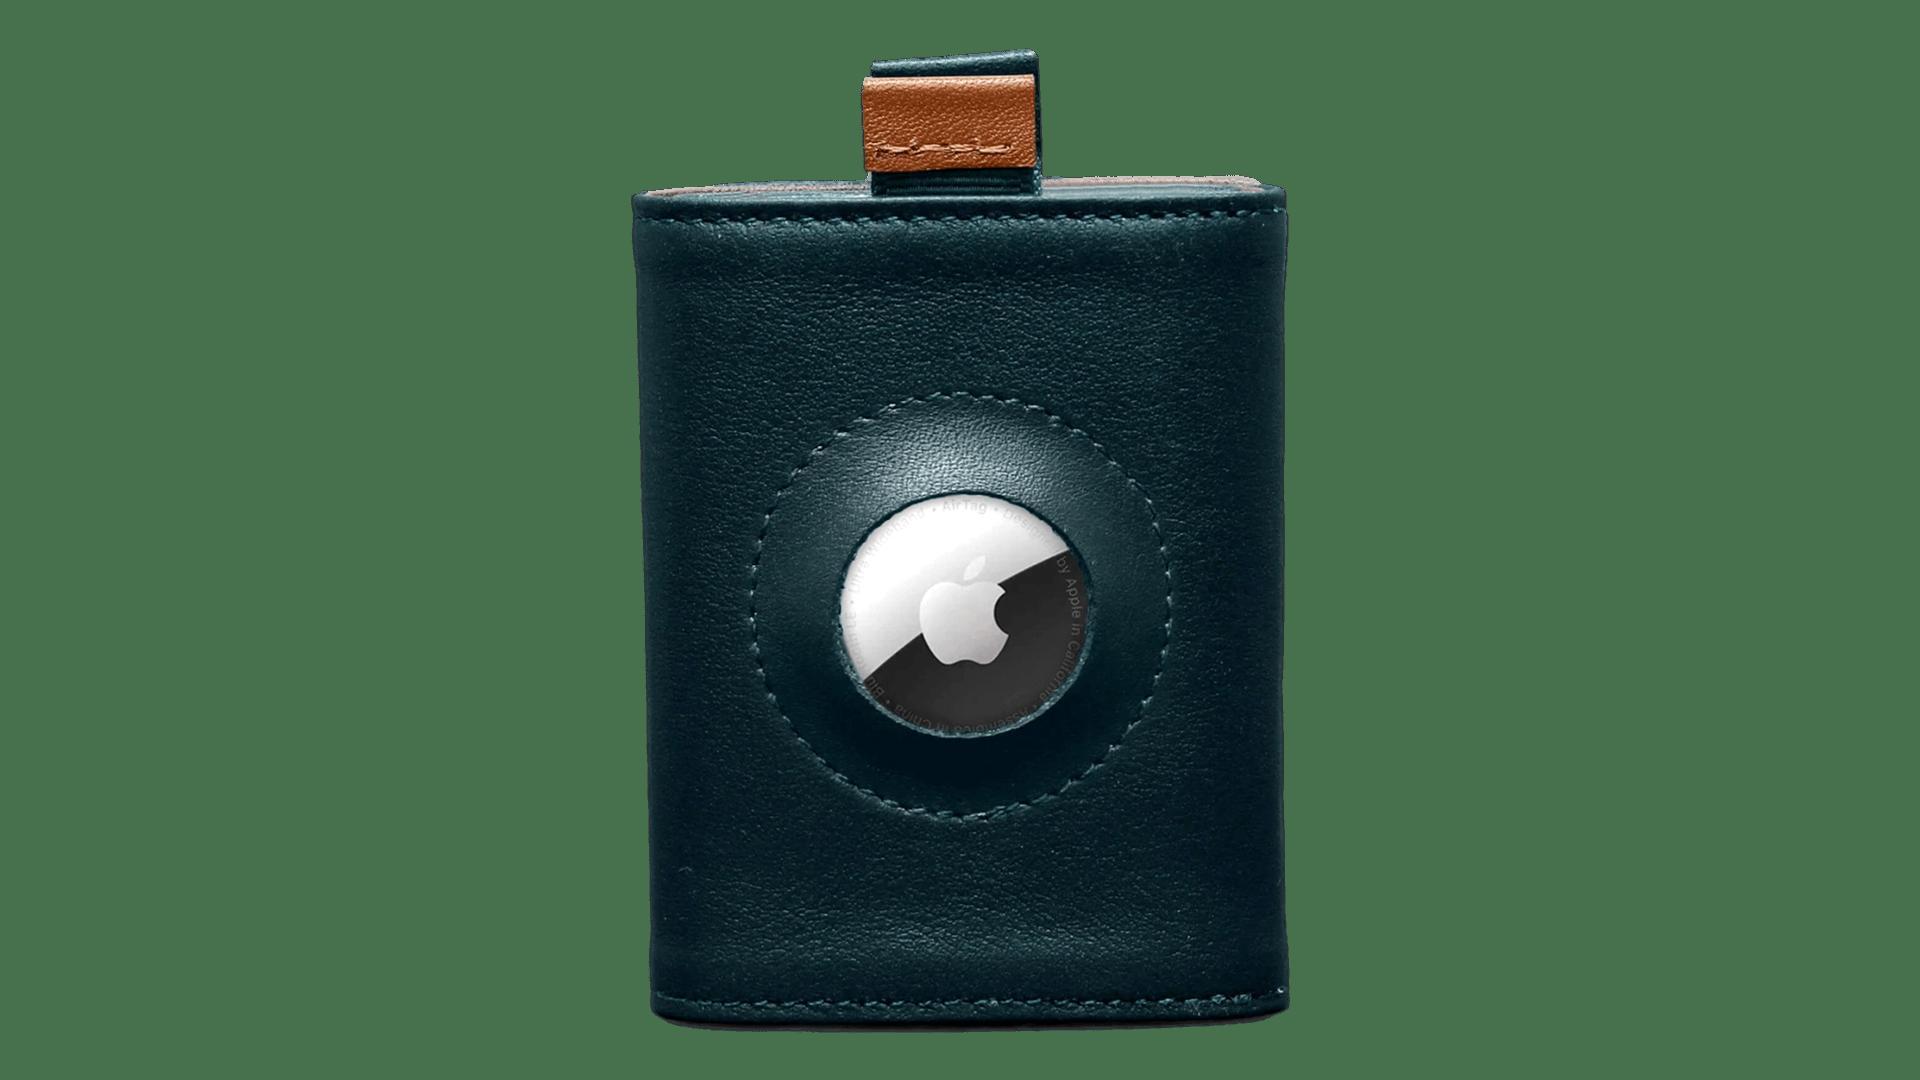 Frenchie Speed Mini Wallet - Airtag